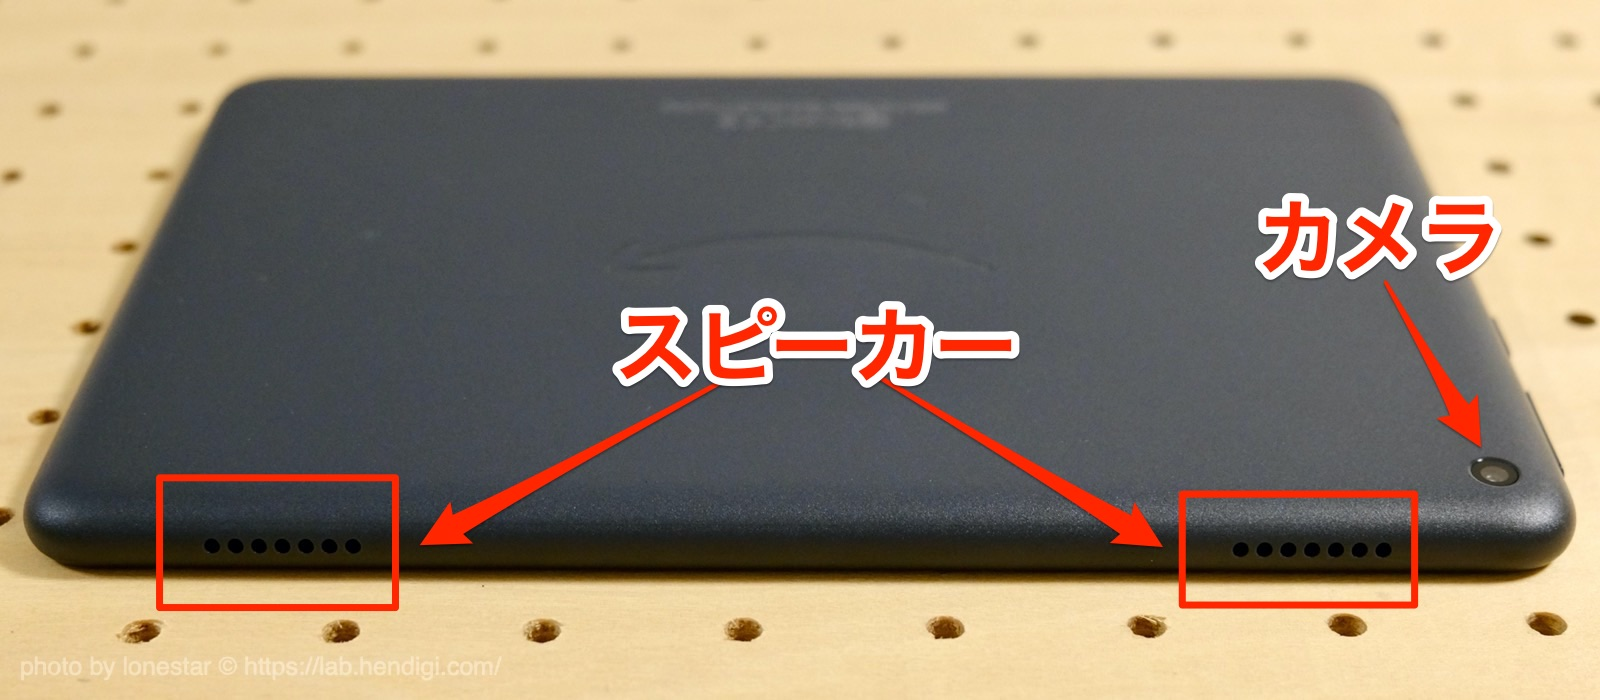 Fire HD 8 スピーカー